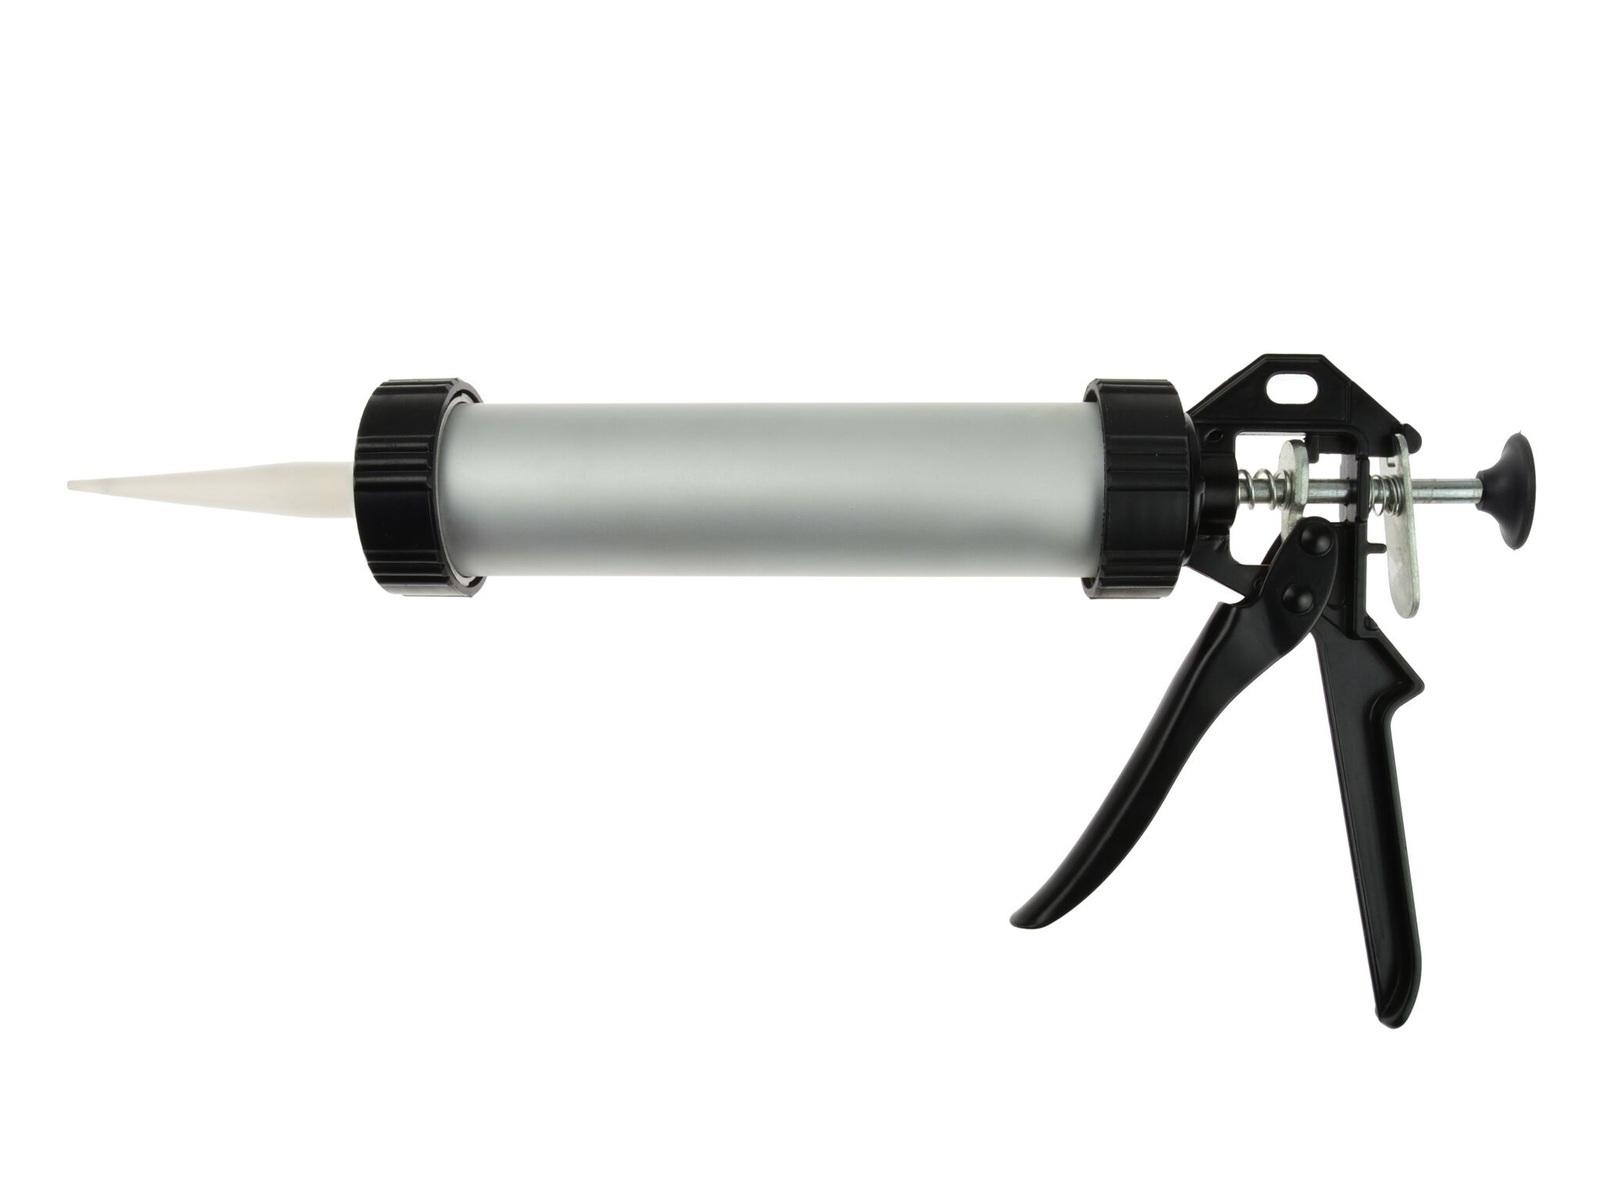 Vytlačovací pistole na kartuše a sáčky, objem 310 ml